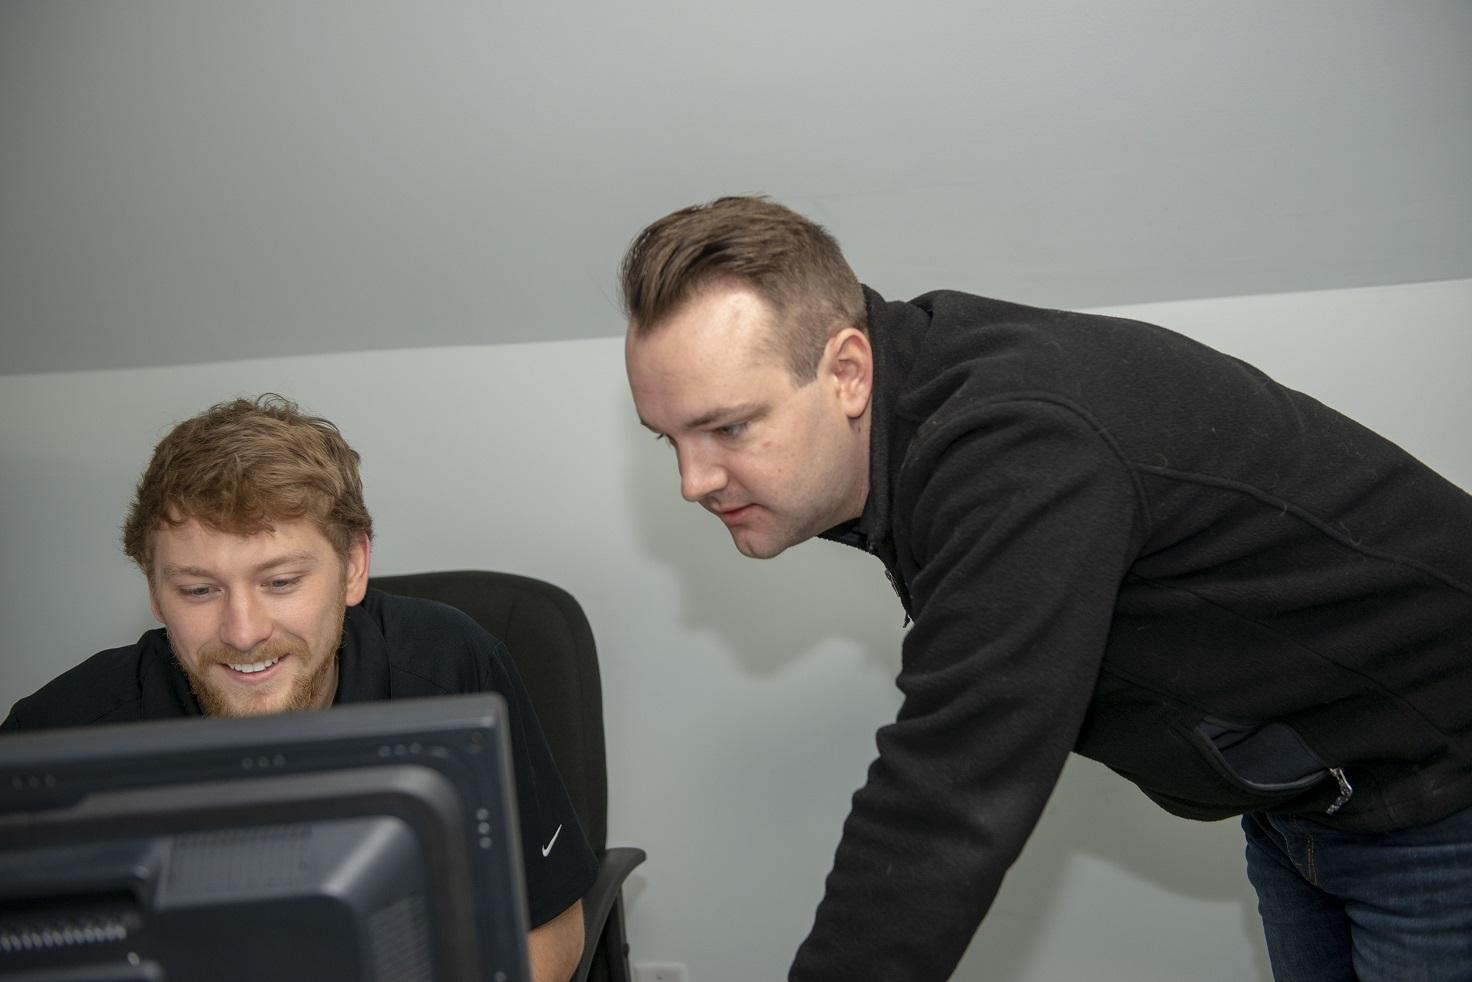 webfeat employees working